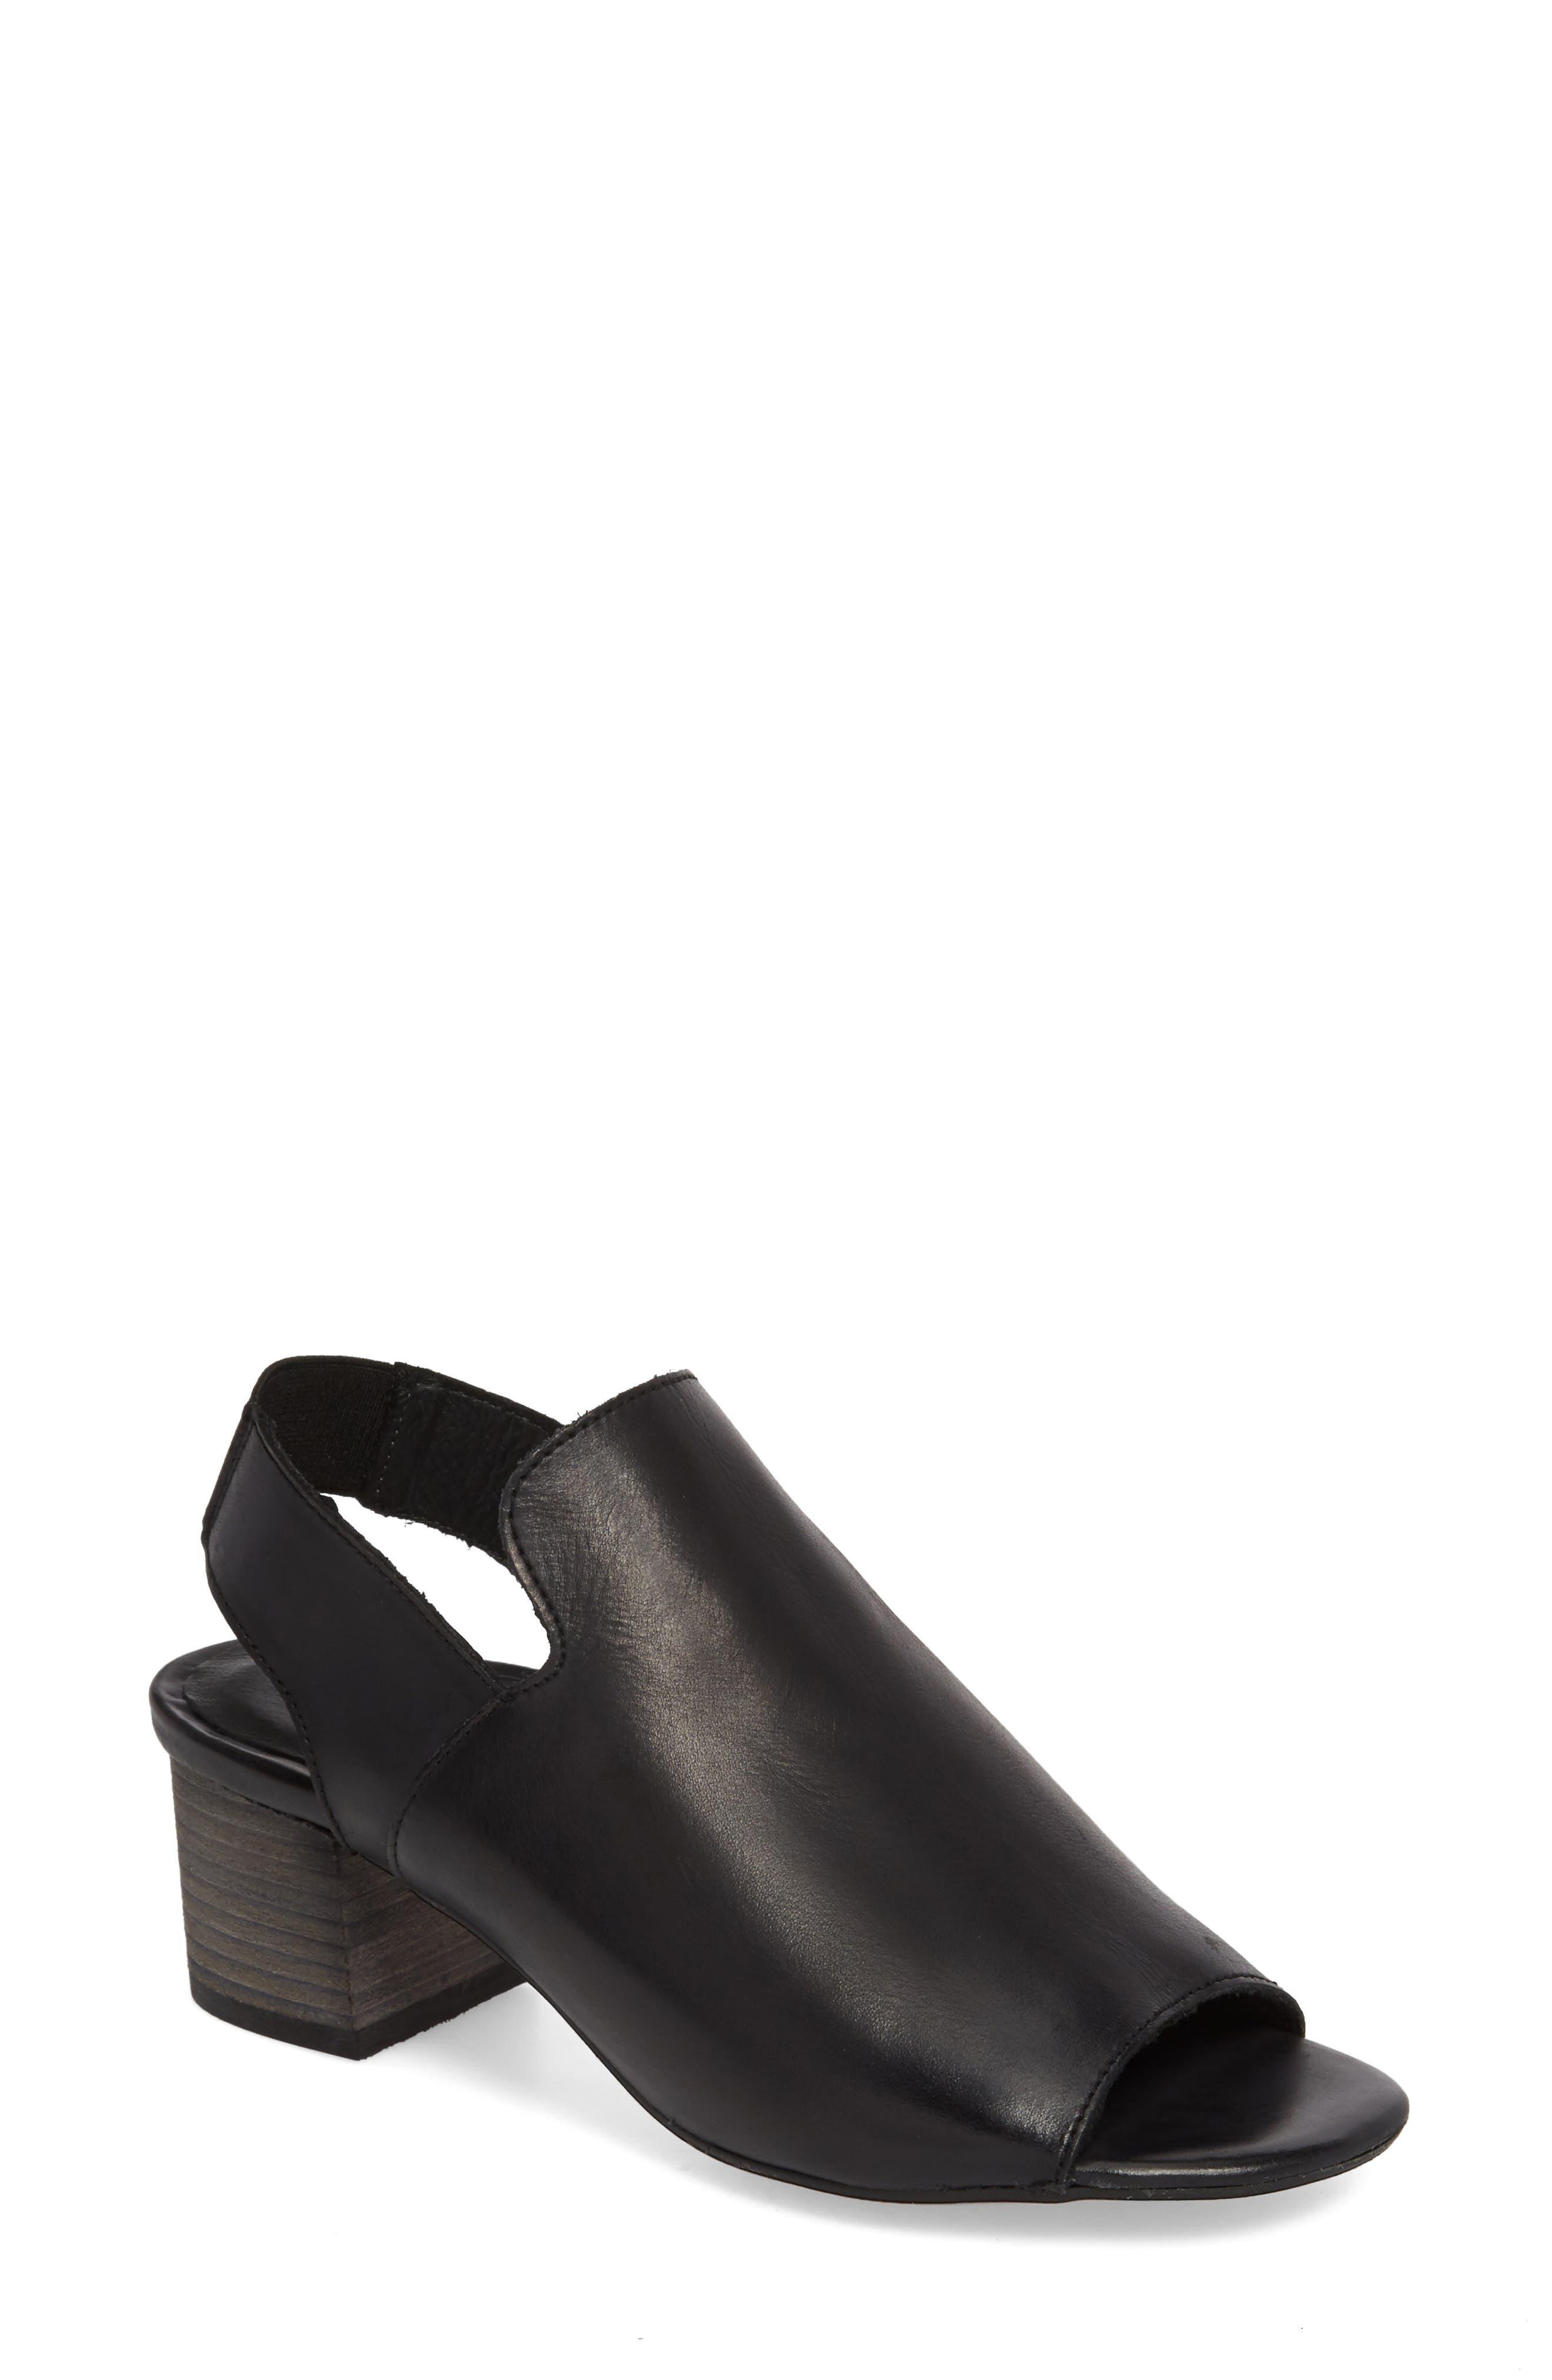 Bos. & Co. Zaire Slingback Sandal, Black